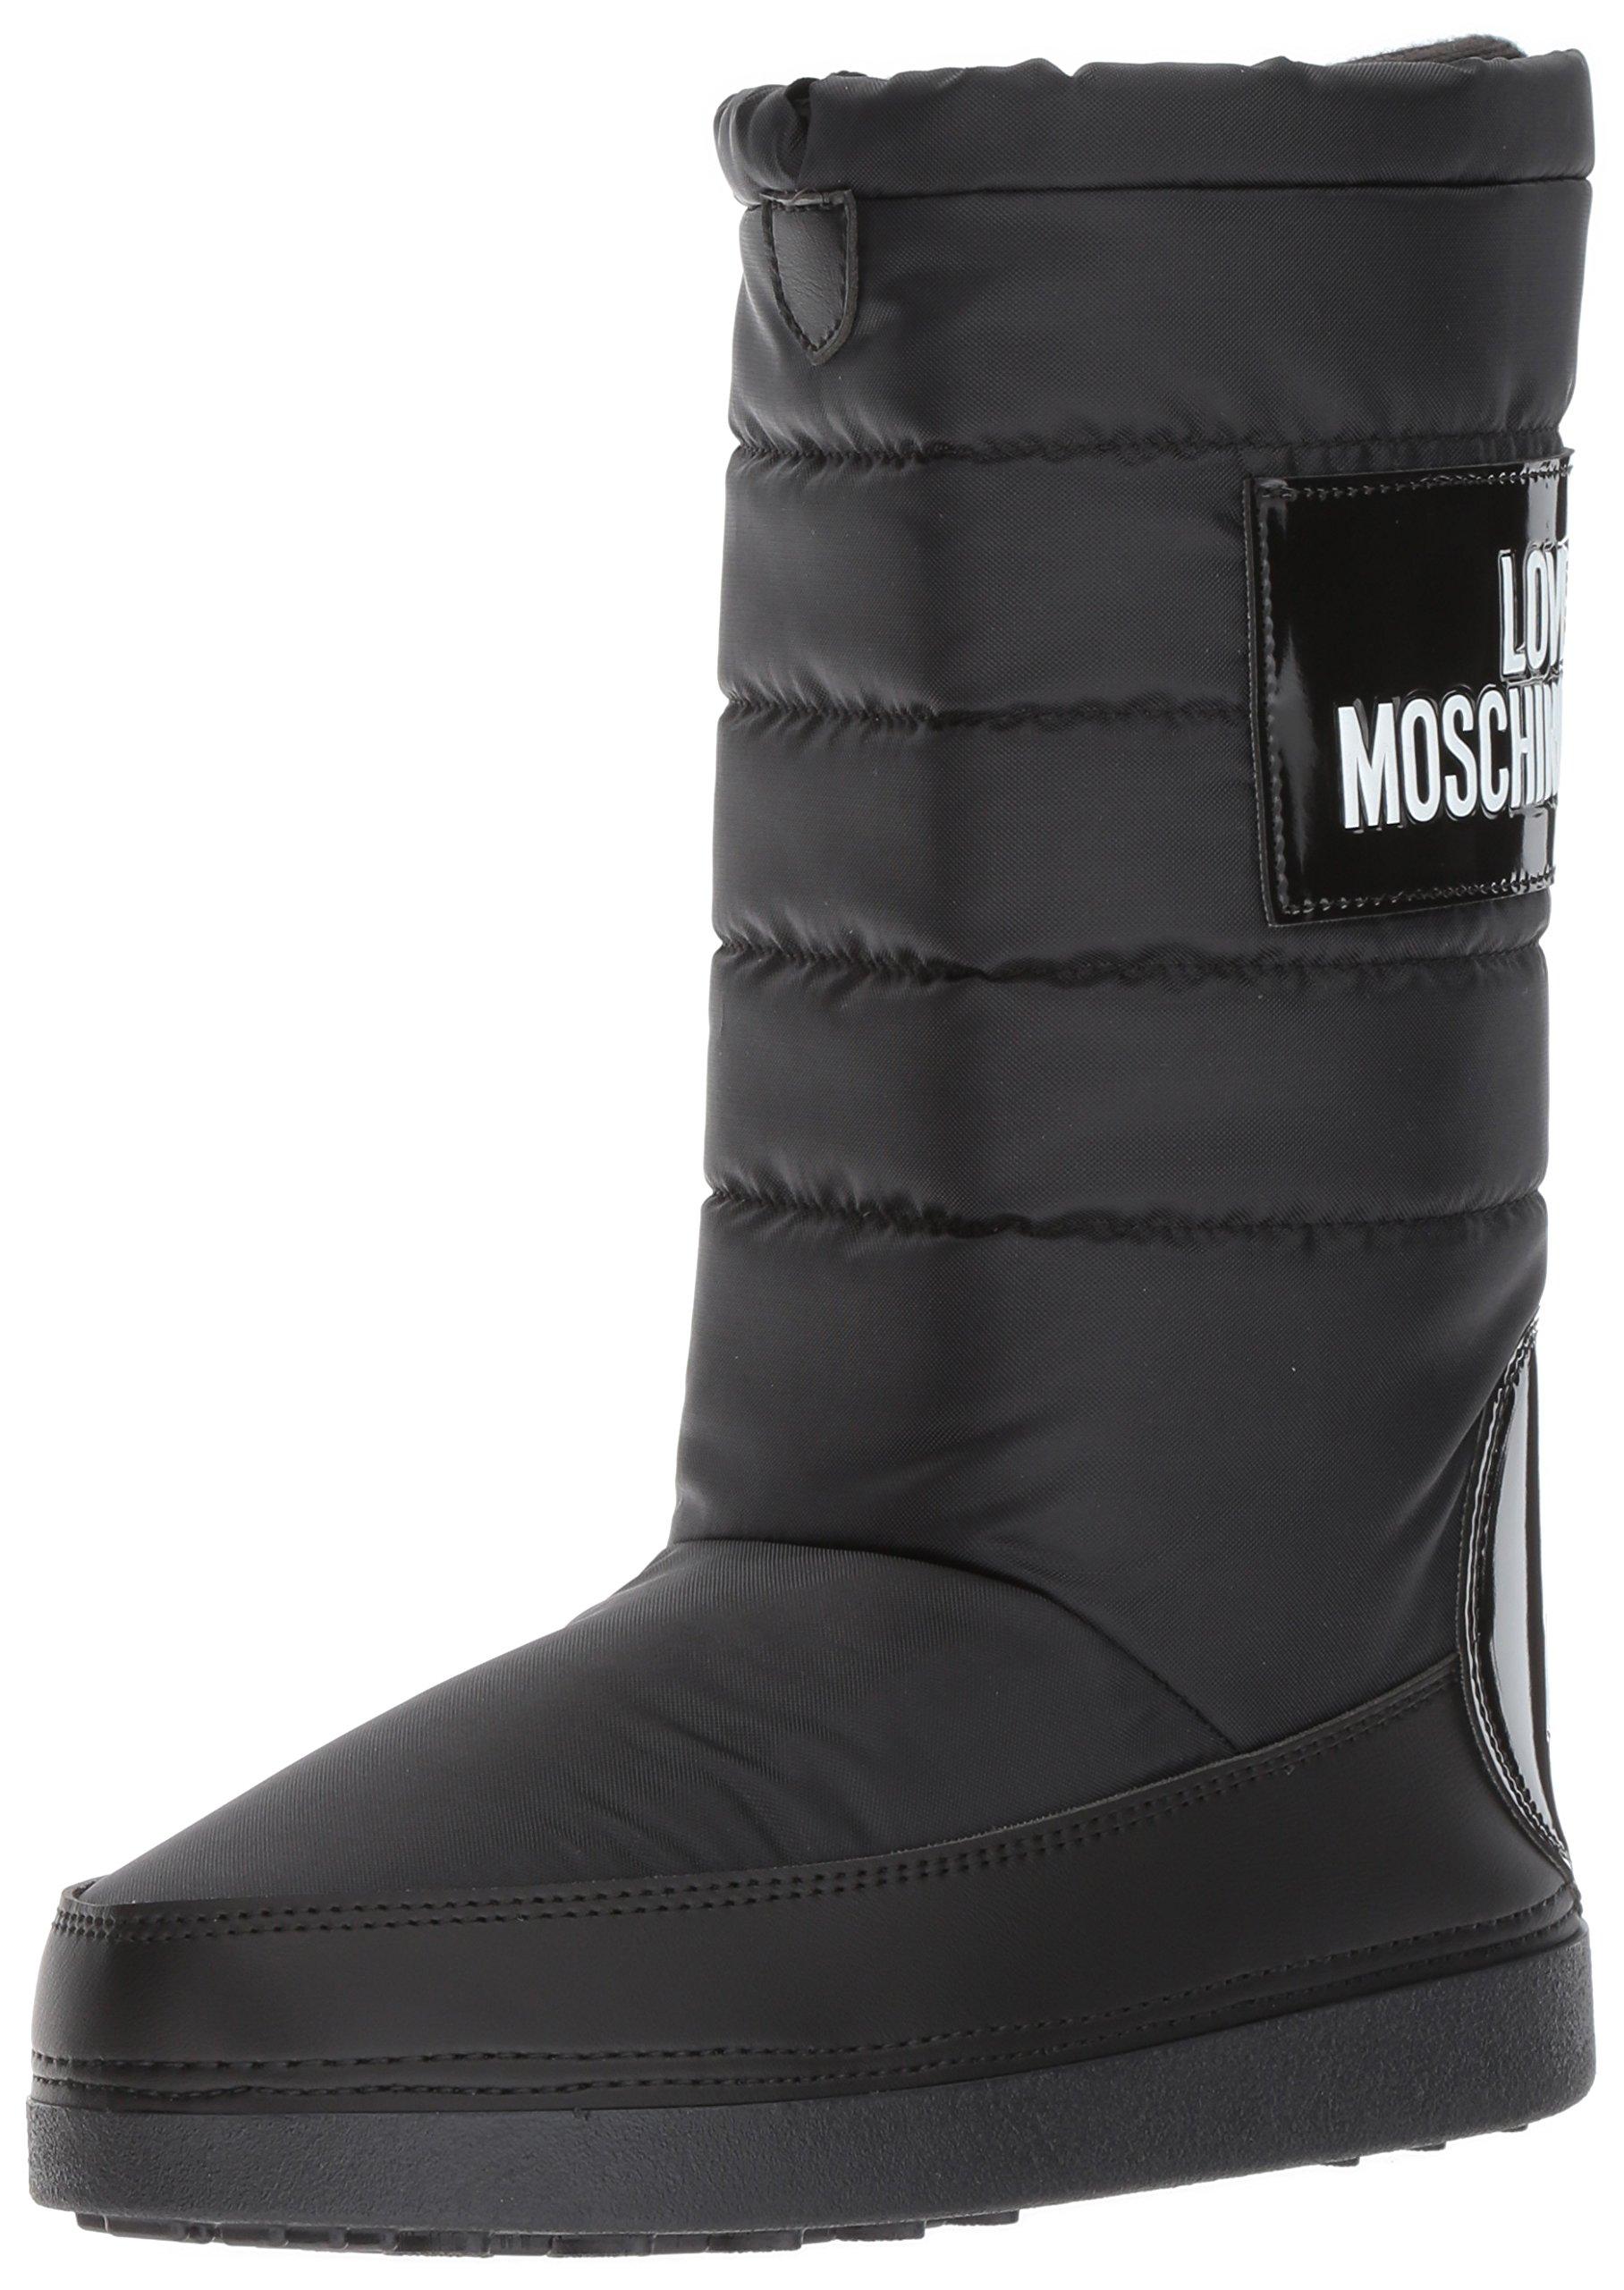 Love Moschino Women's JA24212G04JK100A Fashion Boot, Black, 35-36 M EU (5-6 US)